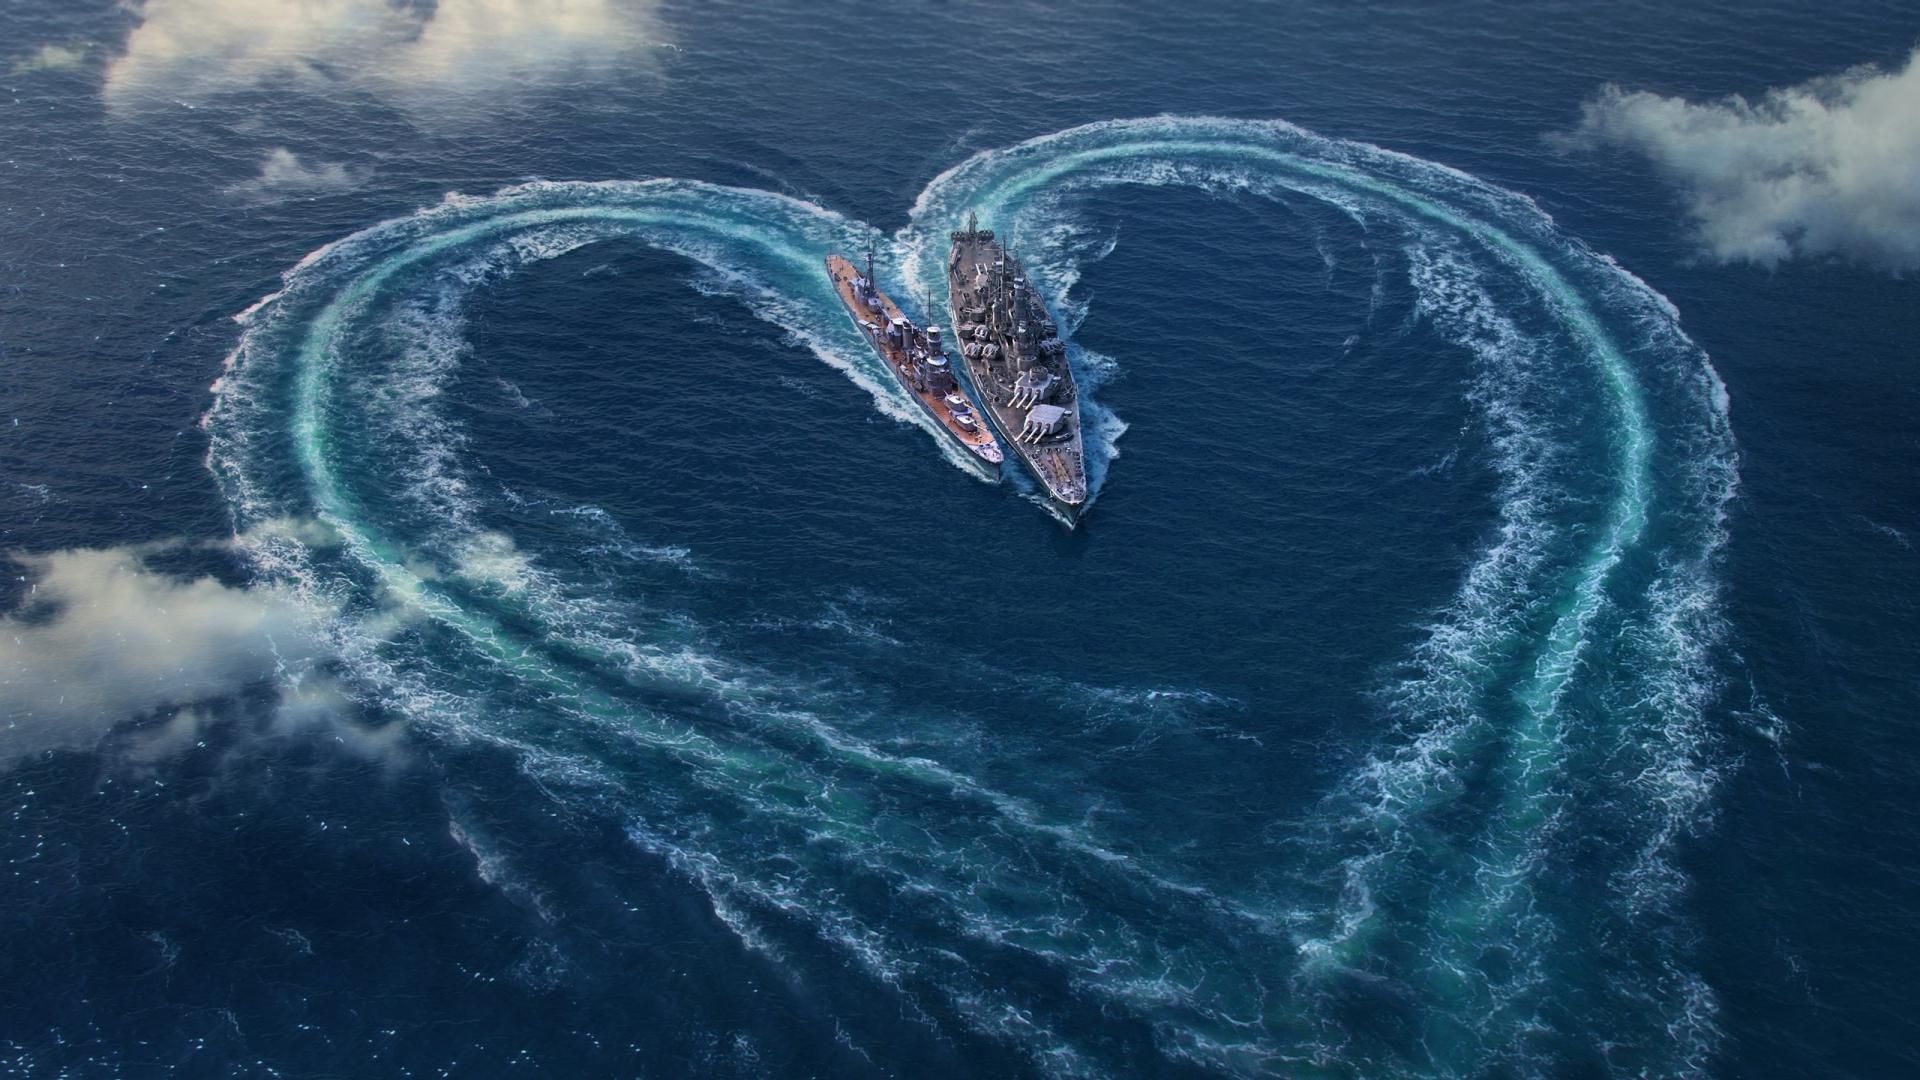 Download 1920x1080 Wallpaper Love Heart World Of Warships